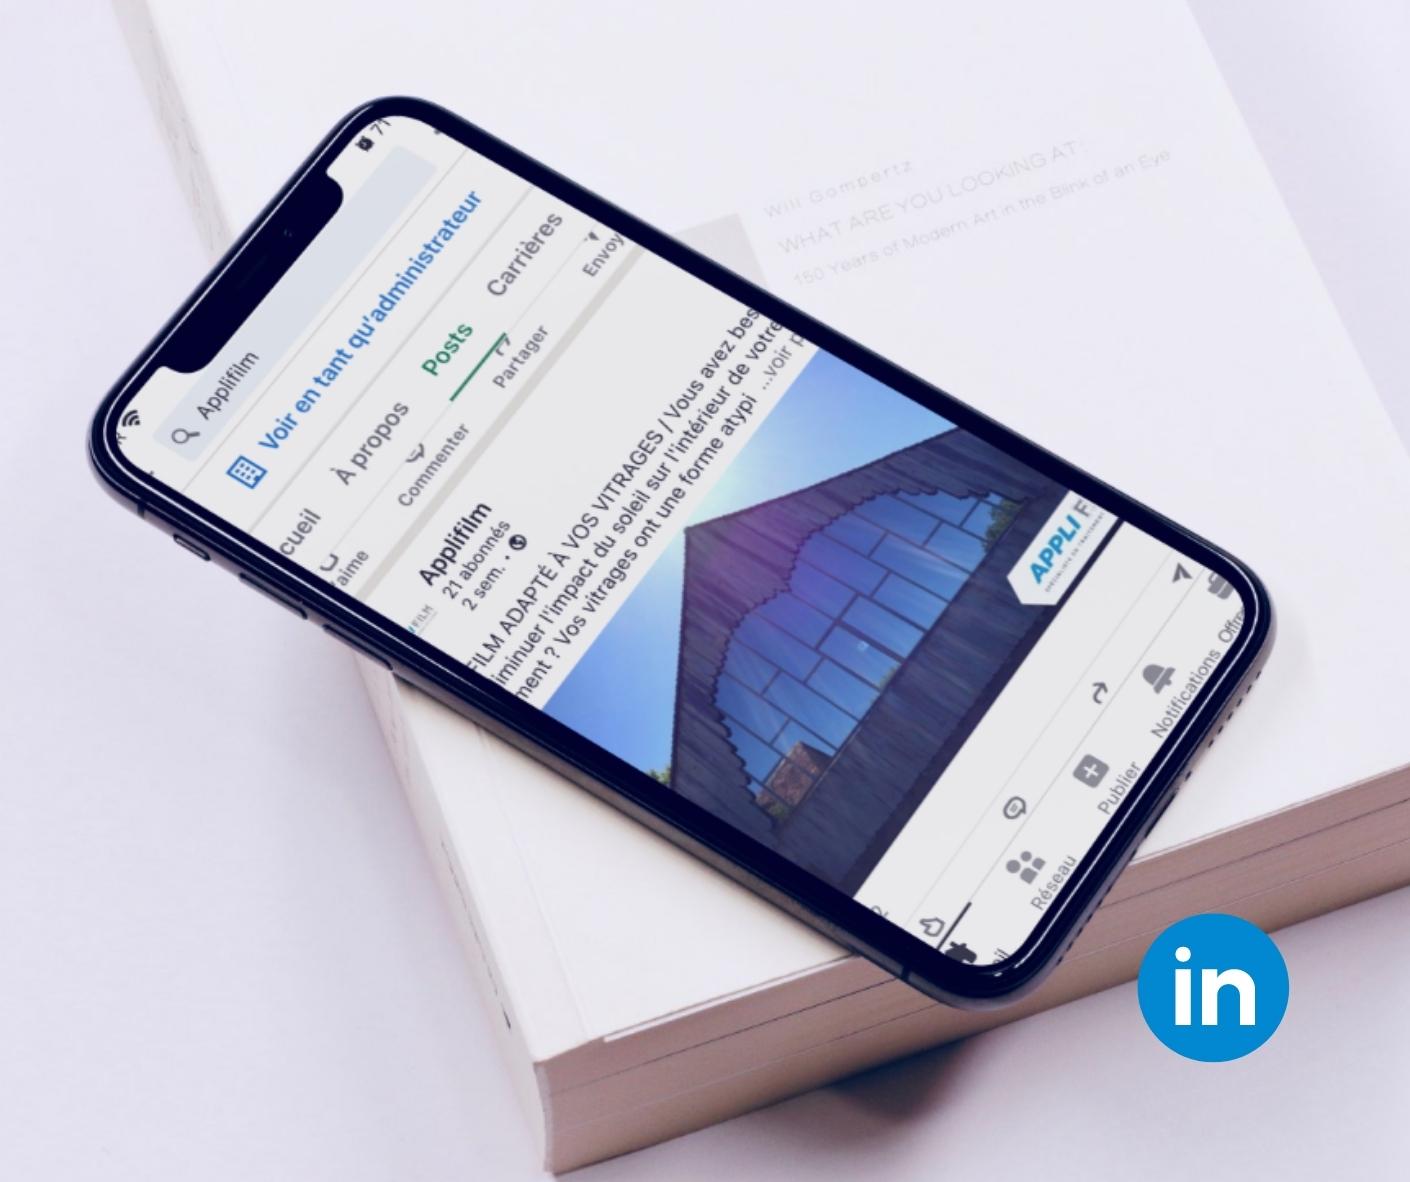 LinkedIn Applifilm - Adékoi communication Périgueux